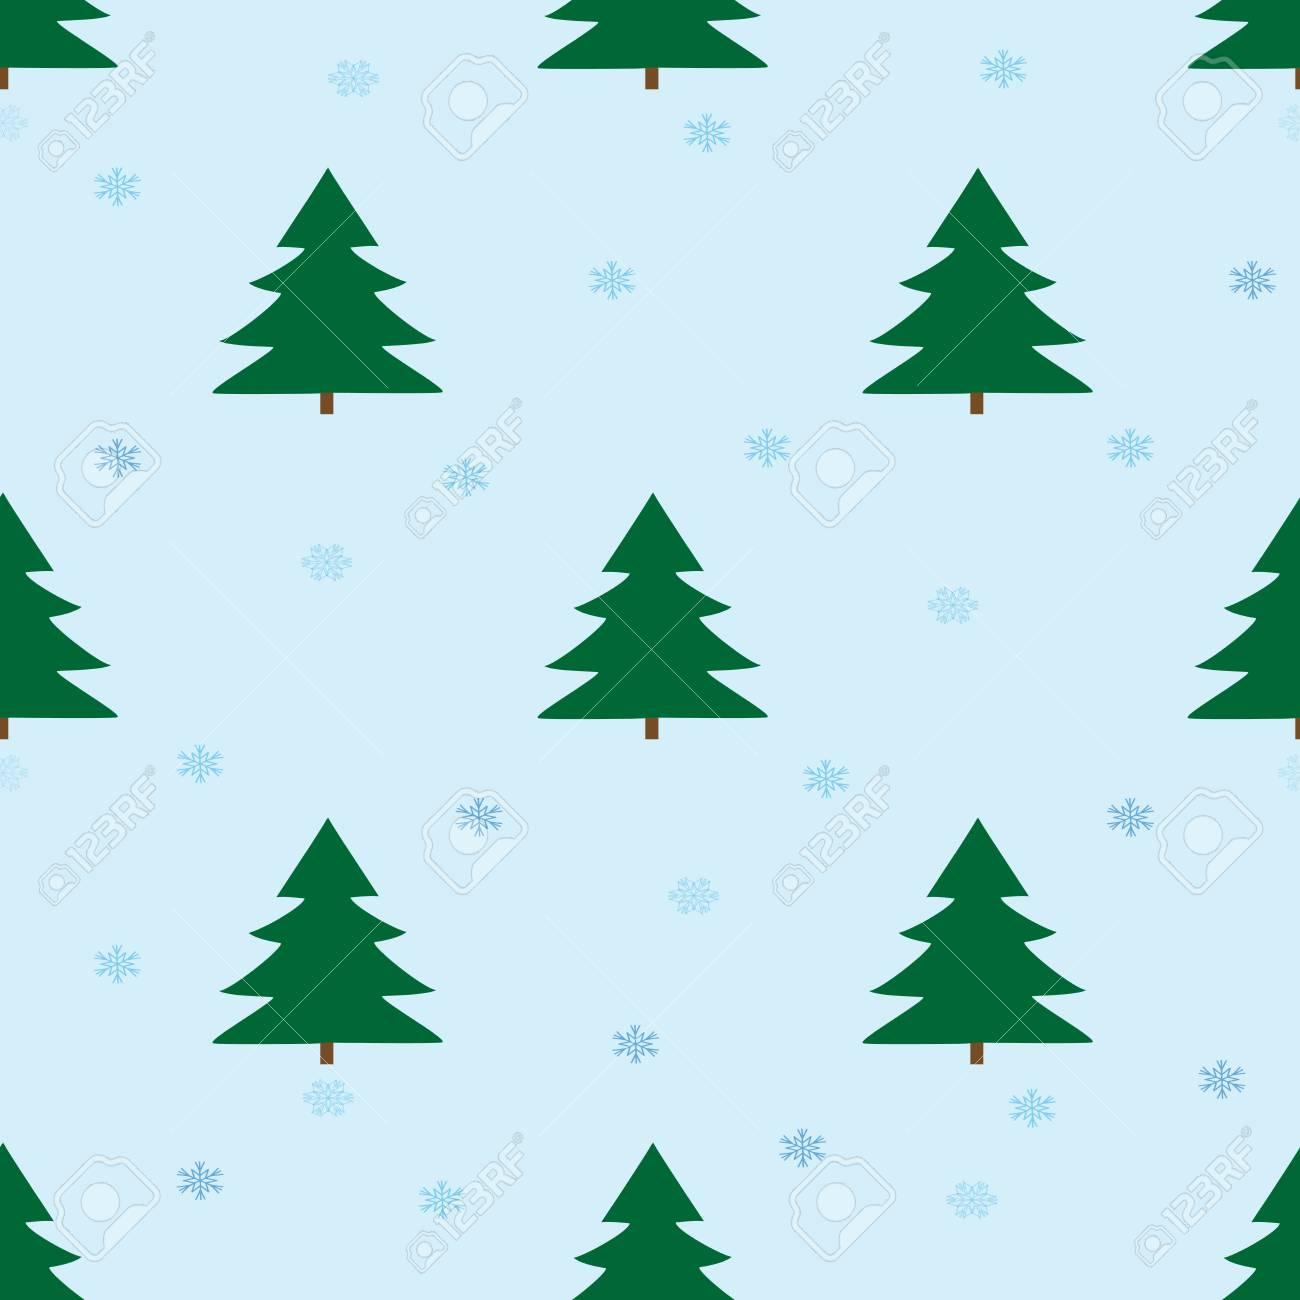 christmas tree seamless pattern. fashion graphic background design